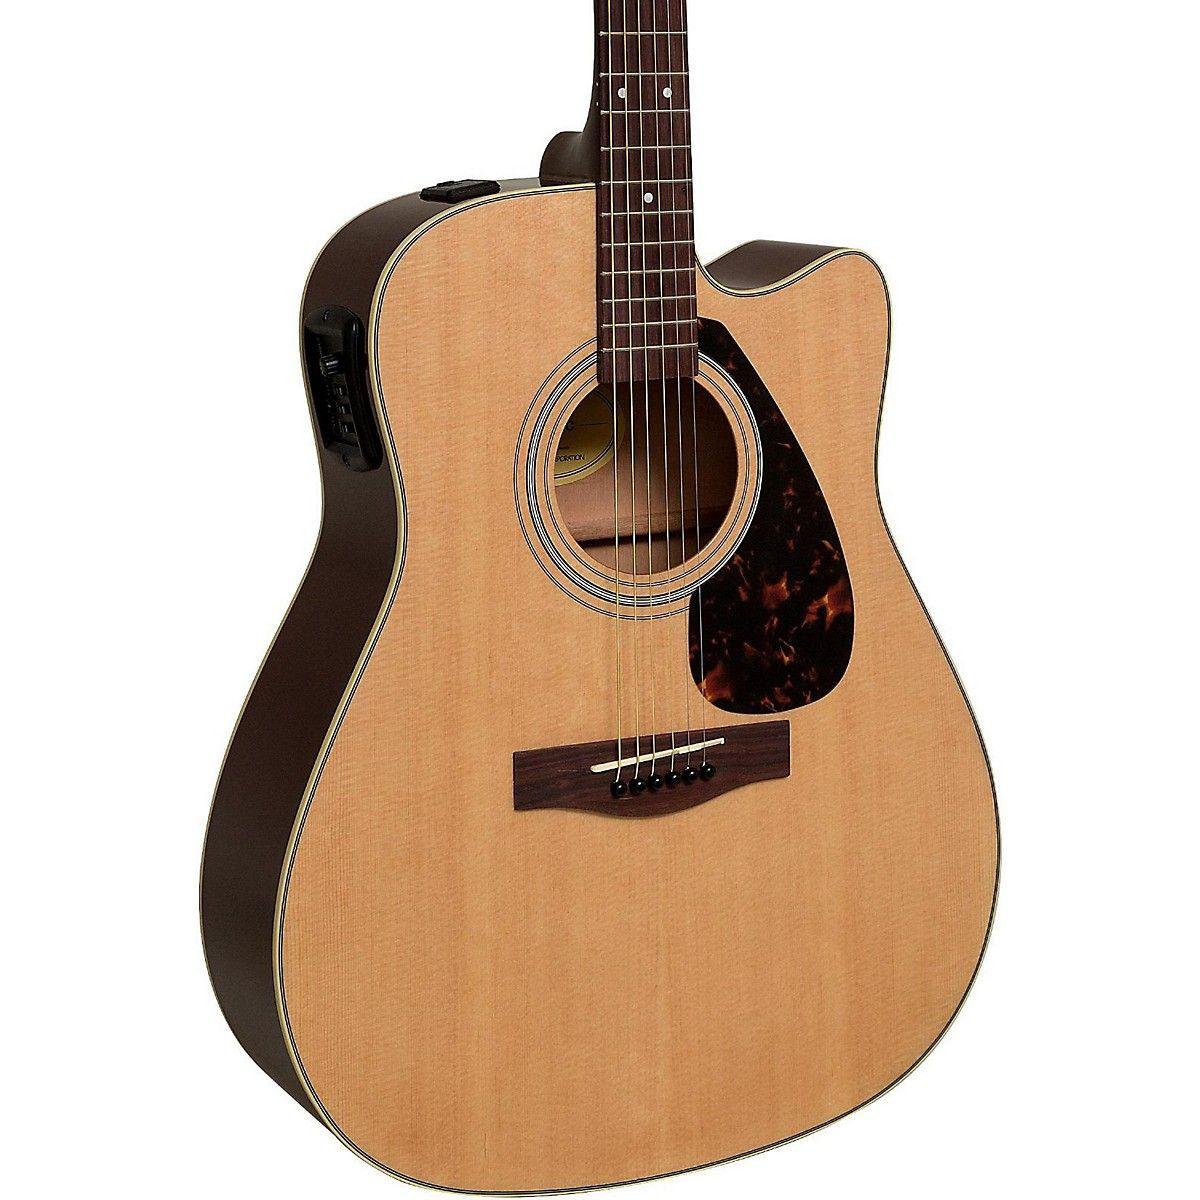 Yamaha Fx335c Dreadnought Acoustic Electric Guitar In 2020 Acoustic Electric Guitar Guitar Tuners Semi Acoustic Guitar